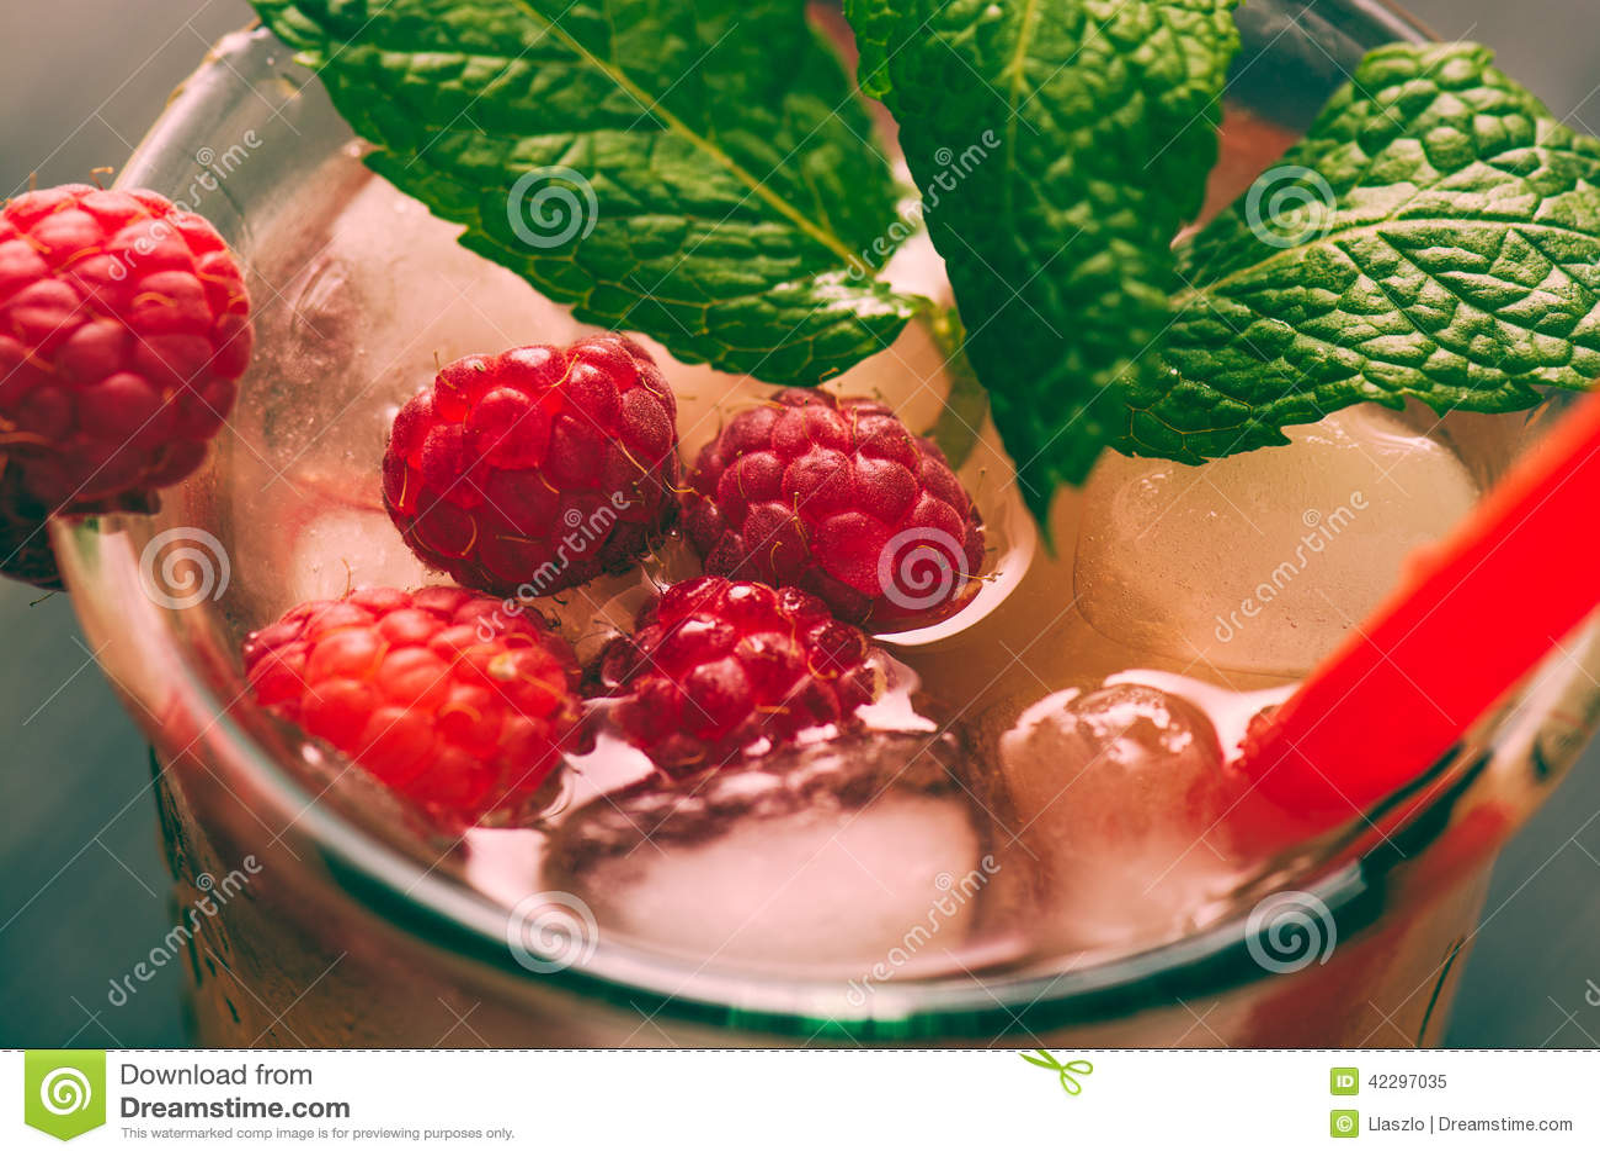 how to make iced tea with tea leaves